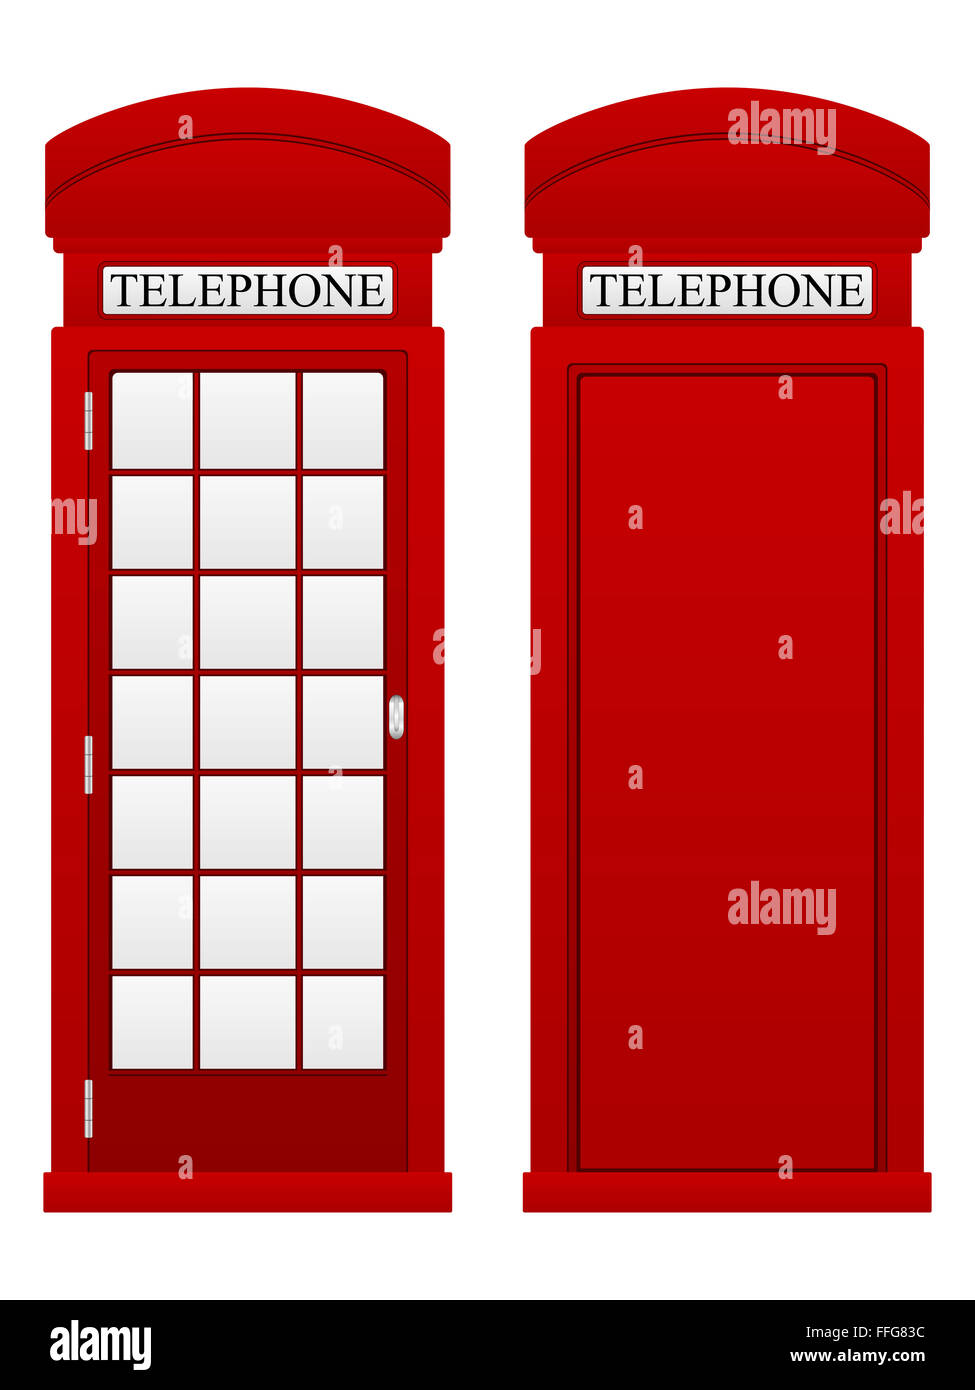 Telephone box on a white background. - Stock Image